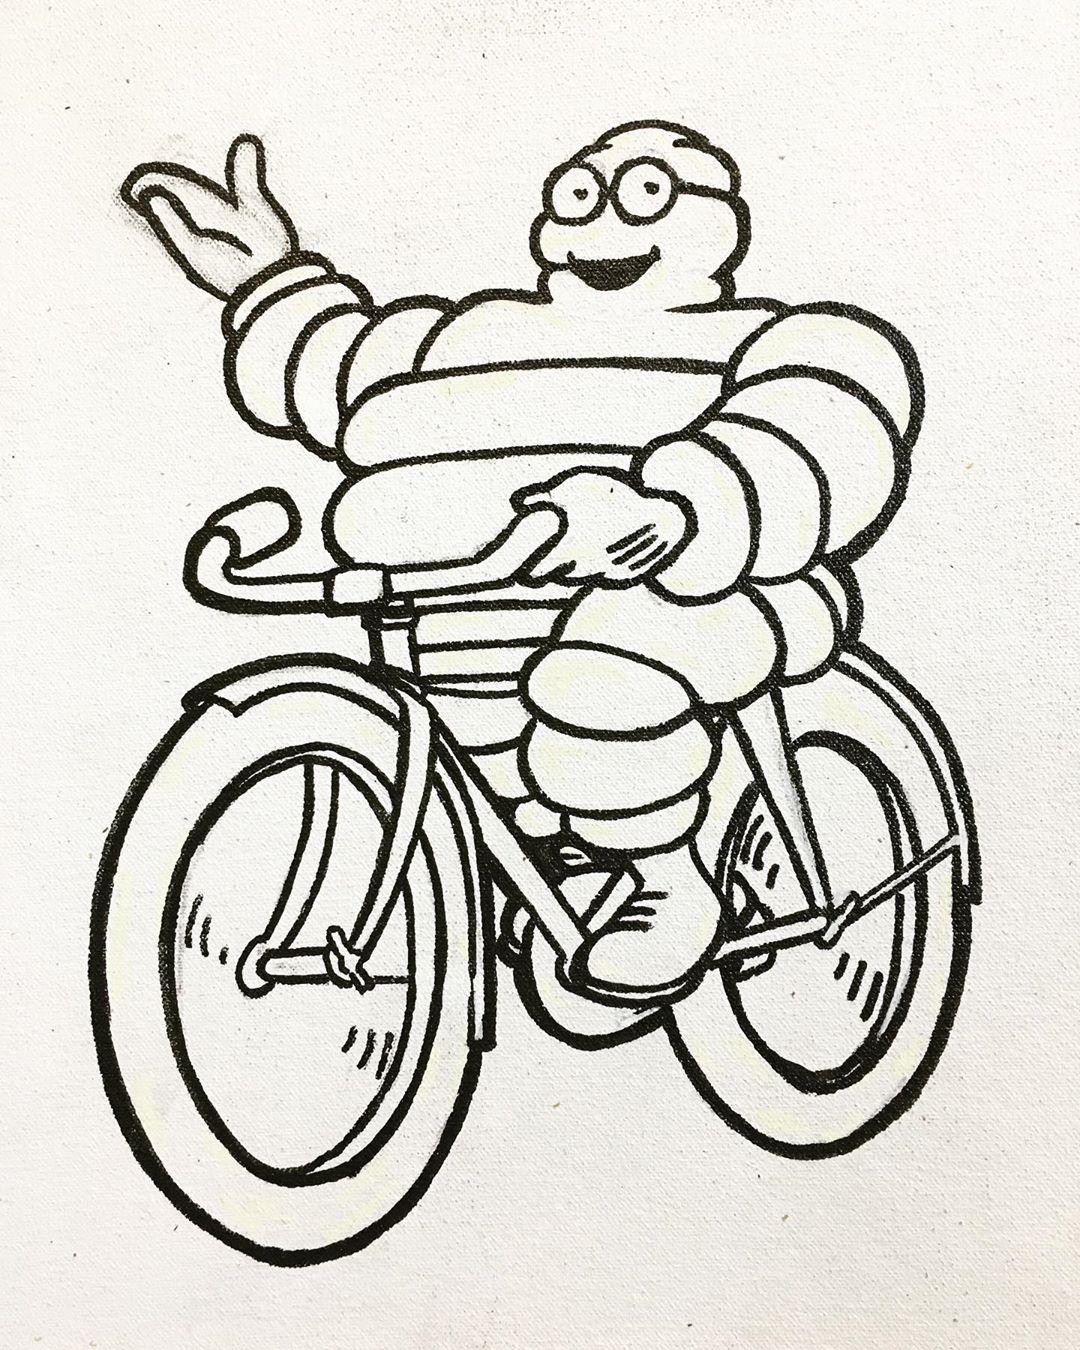 Image of Michelin Man